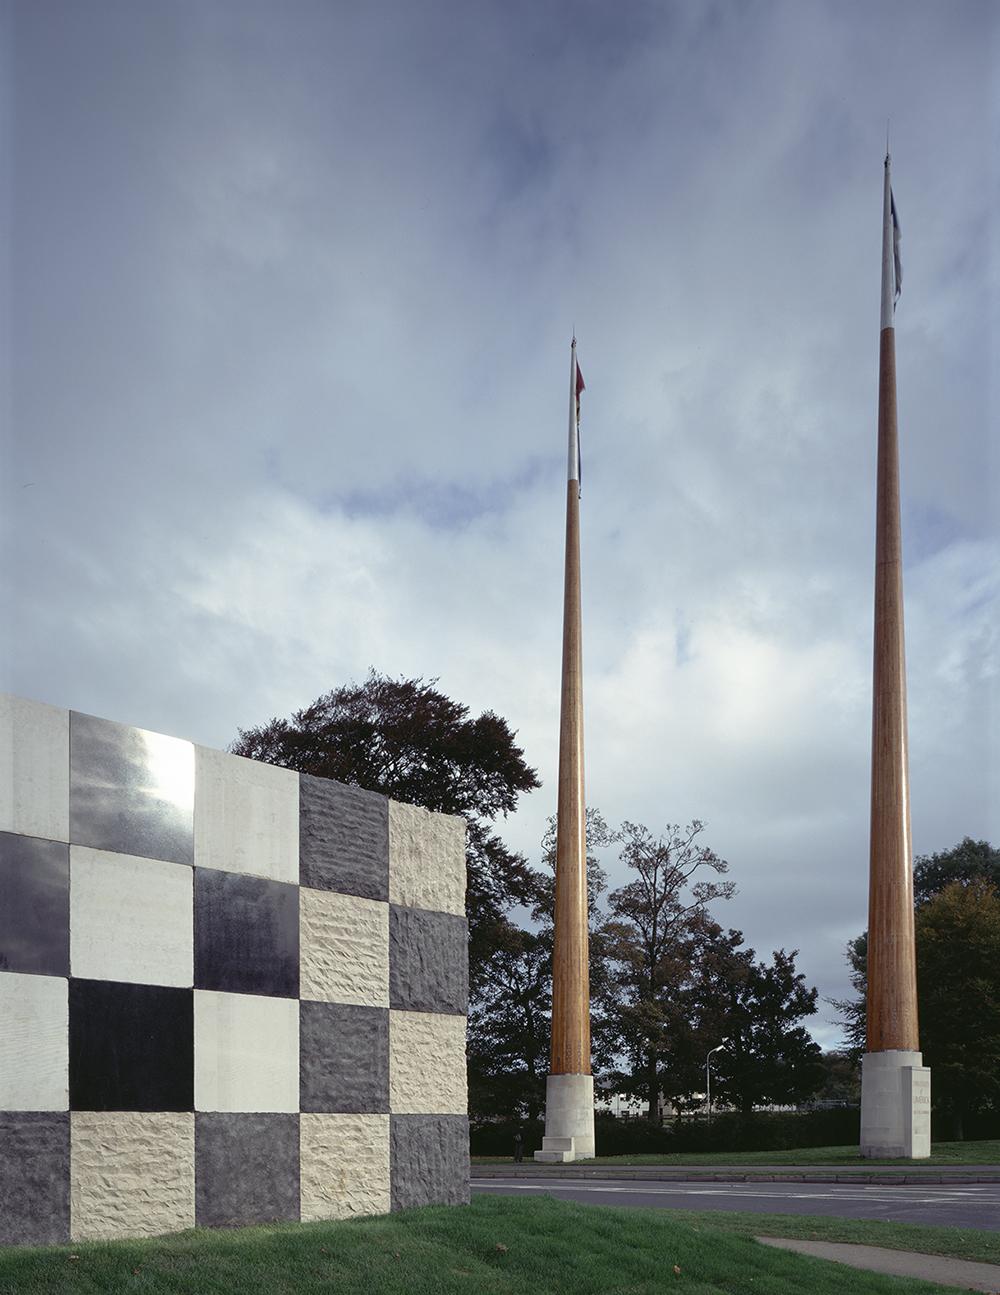 4 University of Limerick - Front